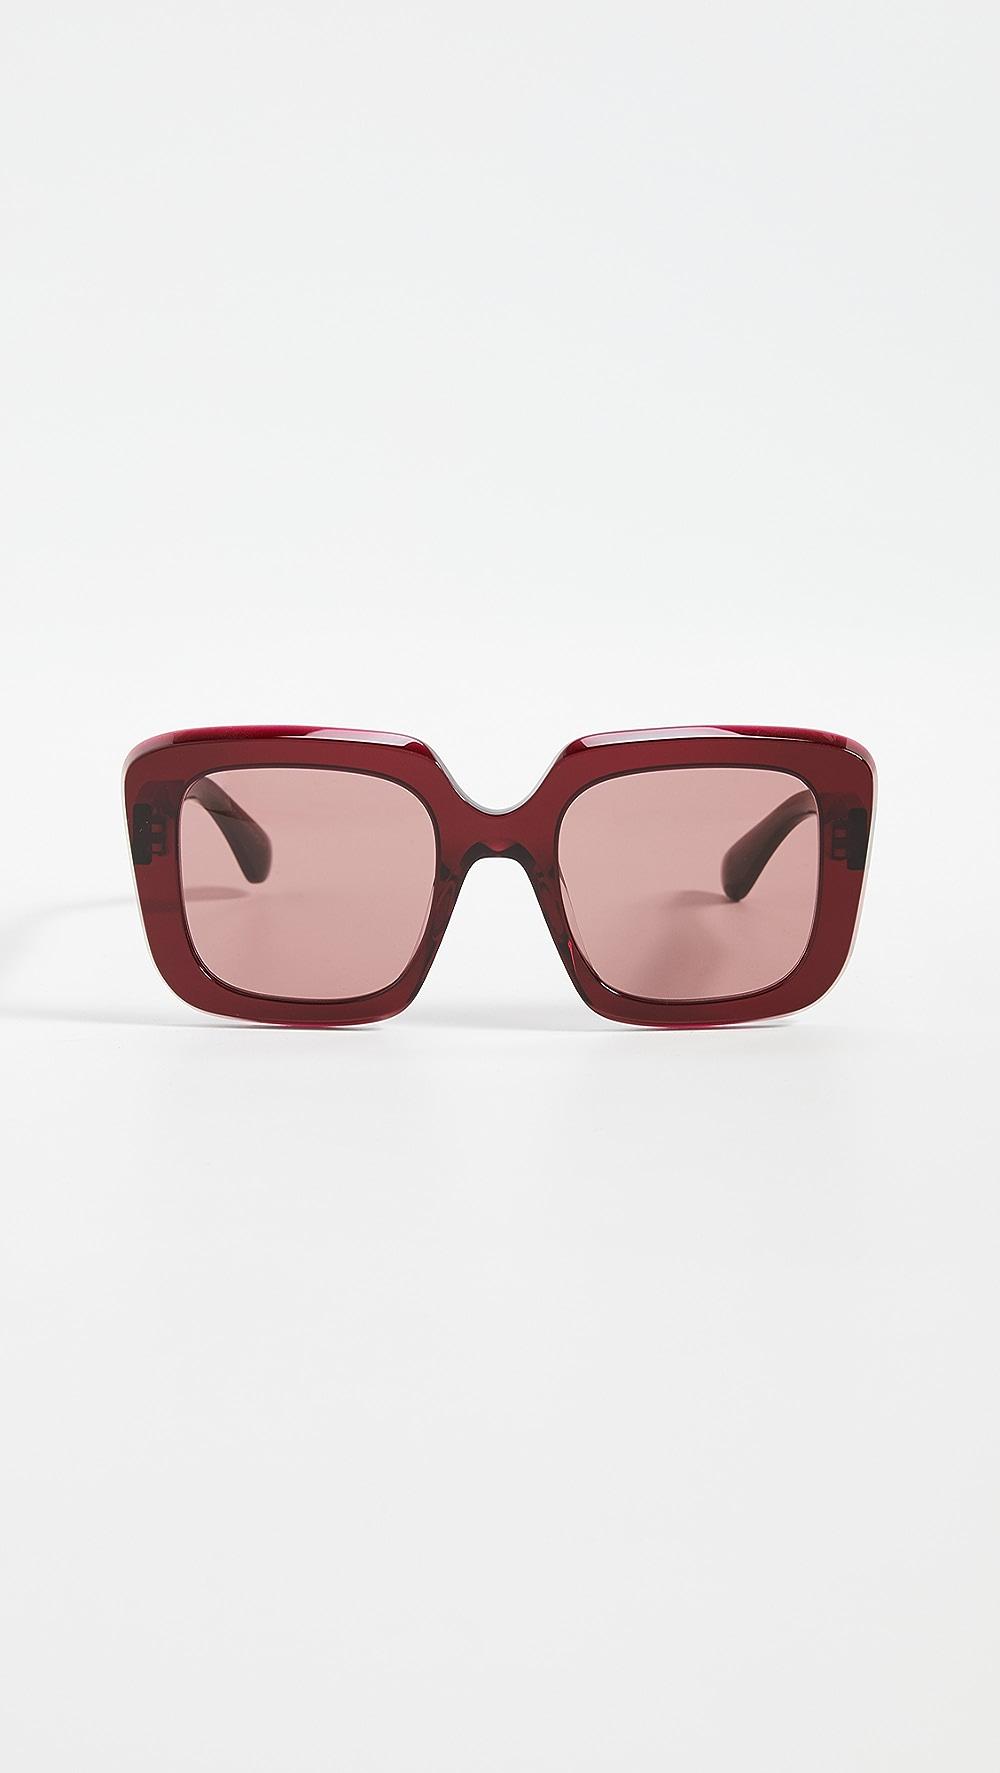 Apprehensive Oliver Peoples Eyewear - Franca Sunglasses Traveling